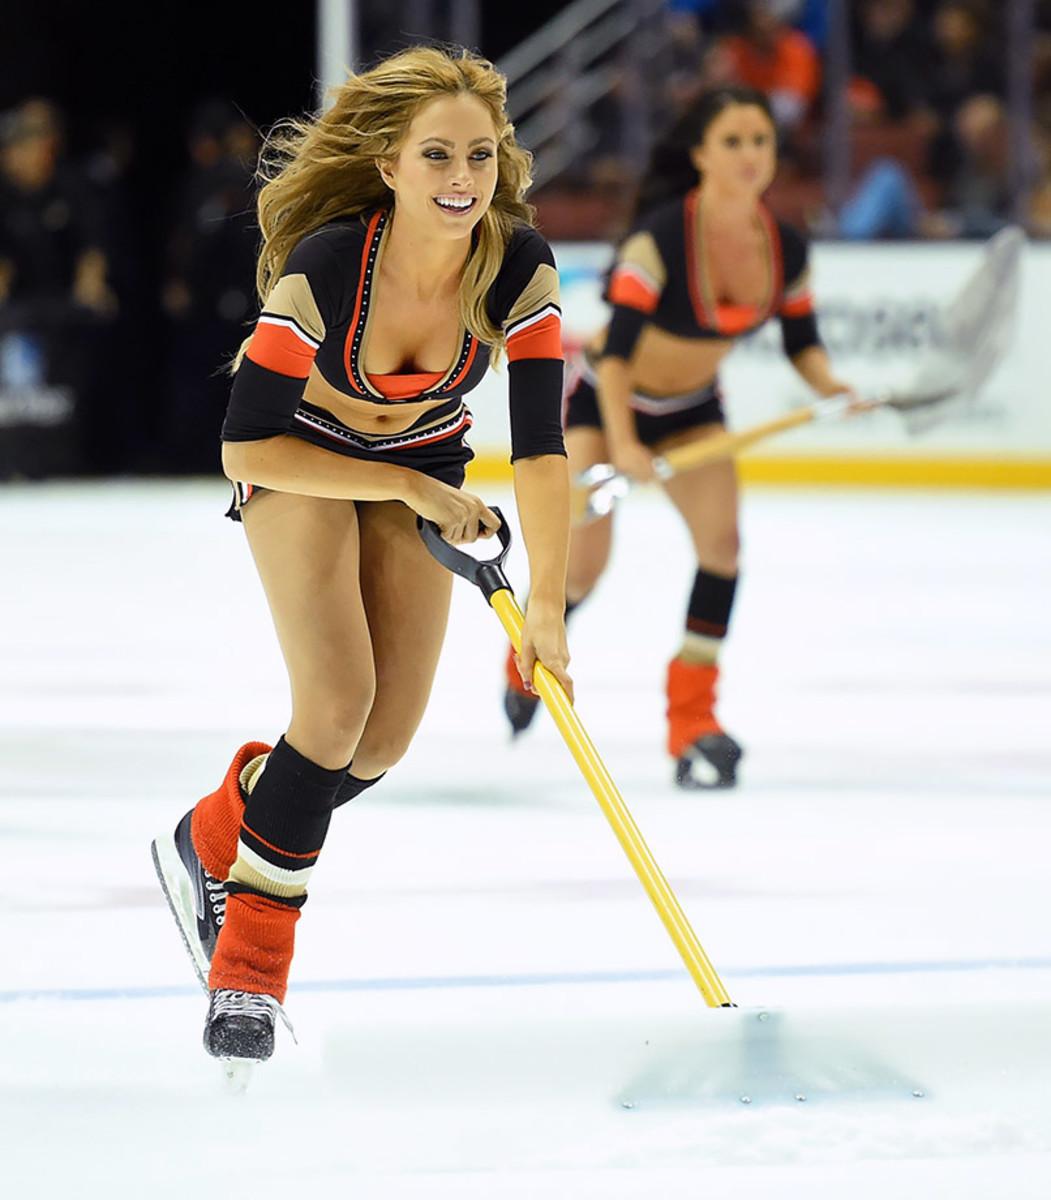 Anaheim-Ducks-Power-Players-Ice-Girls-0071511063323_Blue_Jackets_at_Ducks.jpg